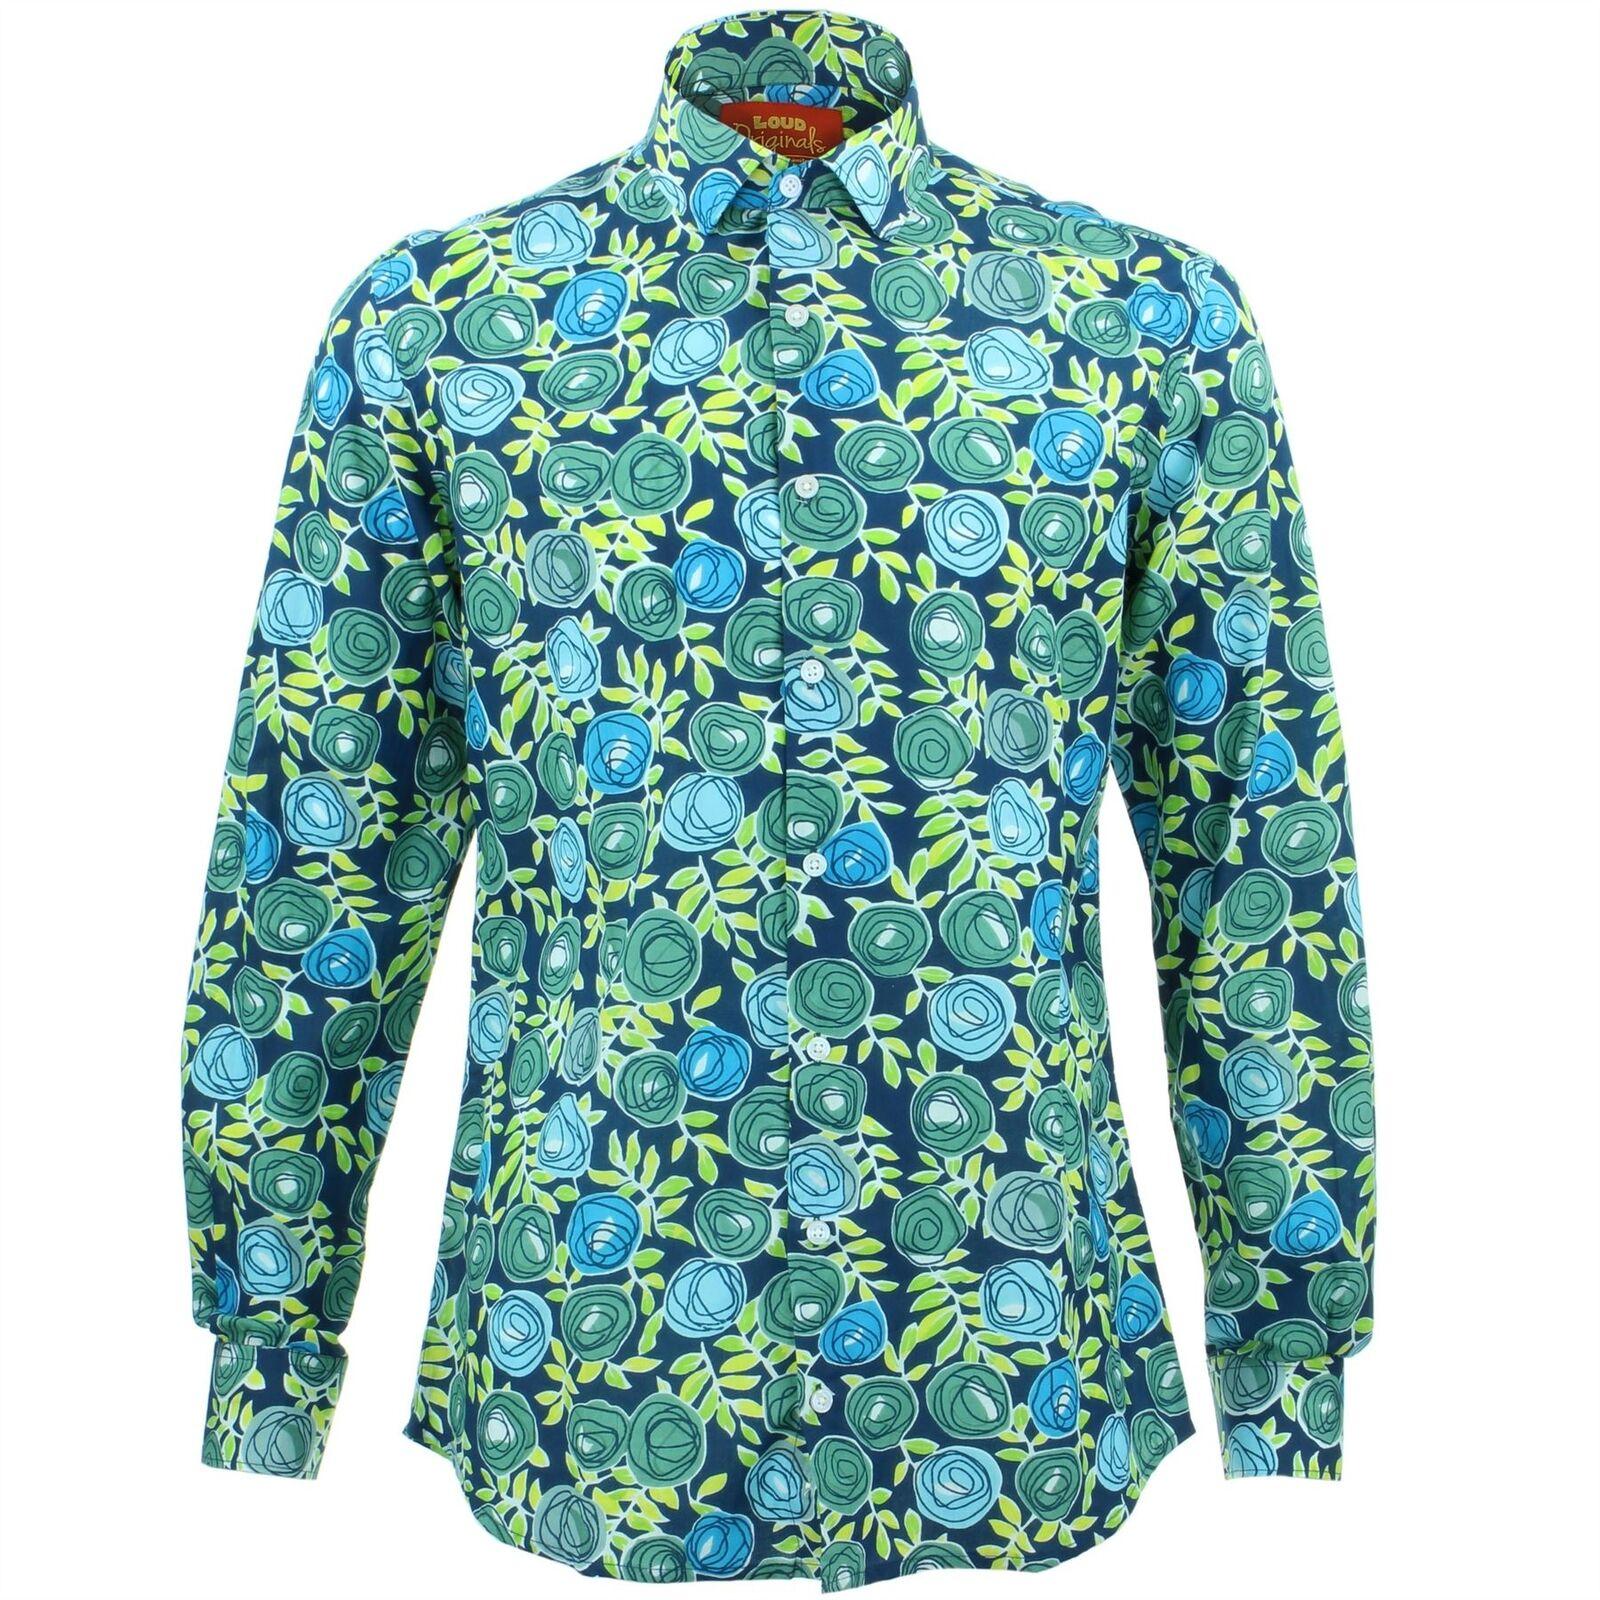 Fit Fancy Bluee Loud Tailored Shirt Pinks Retro Originals Mens v0nmN8w